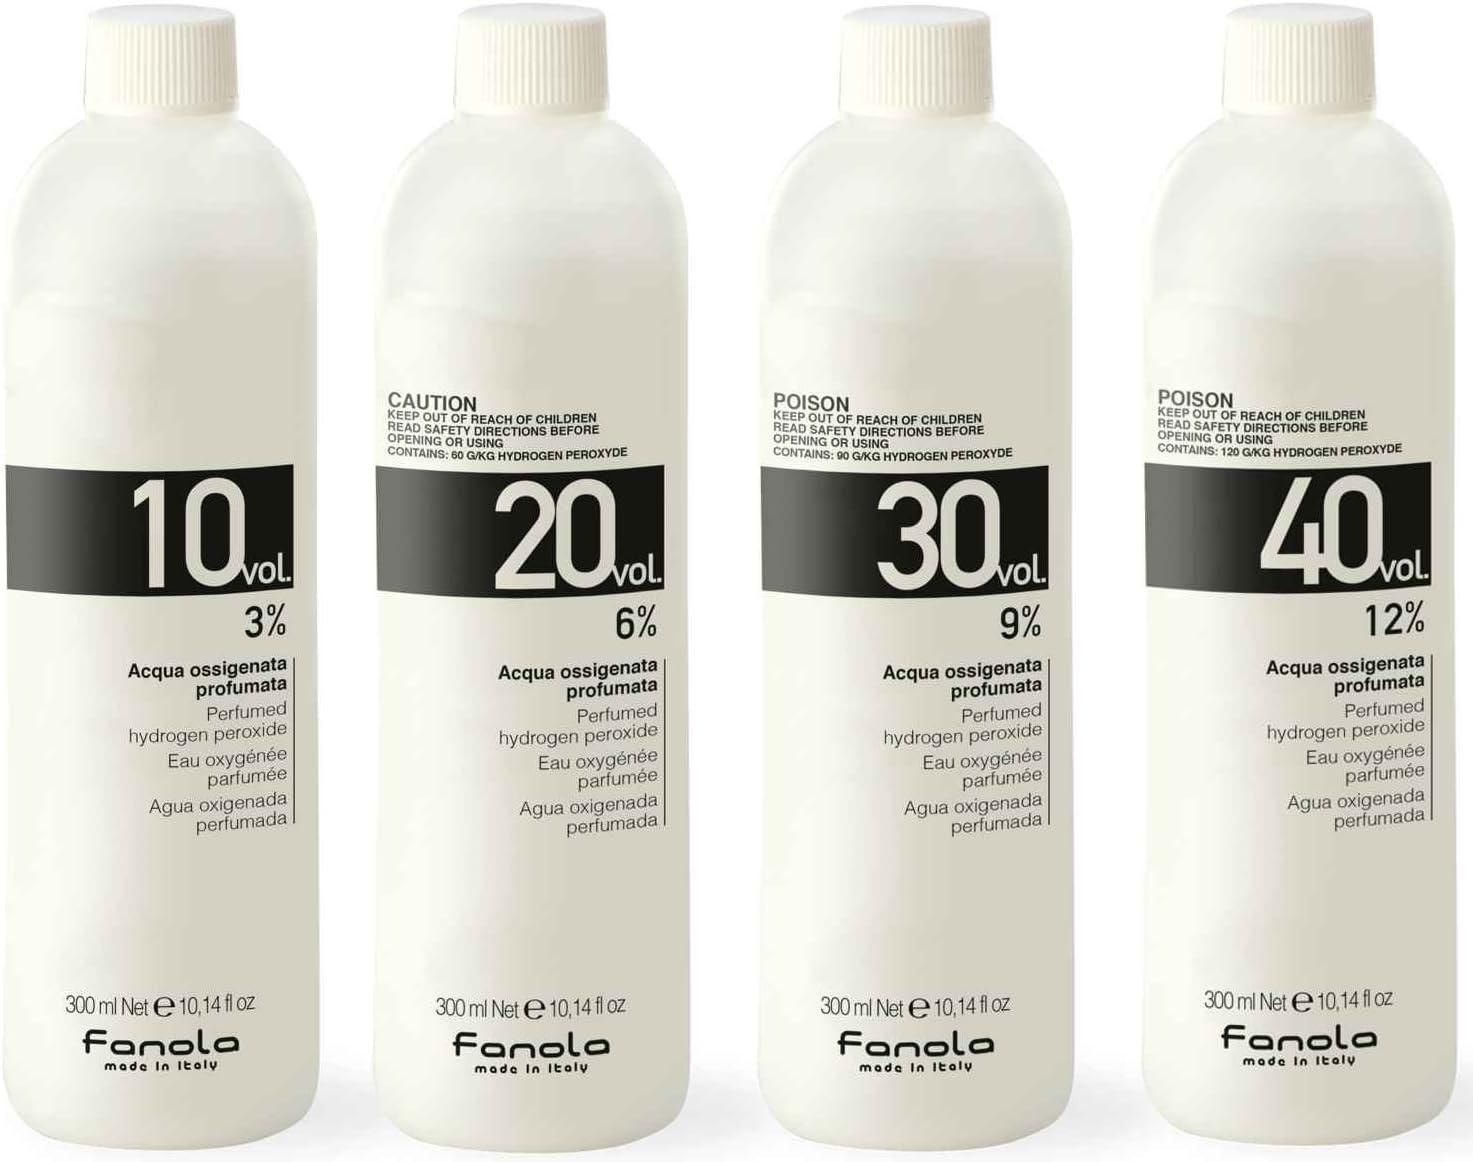 Fanola 40 Vol. 12% peróxido, 300 ml